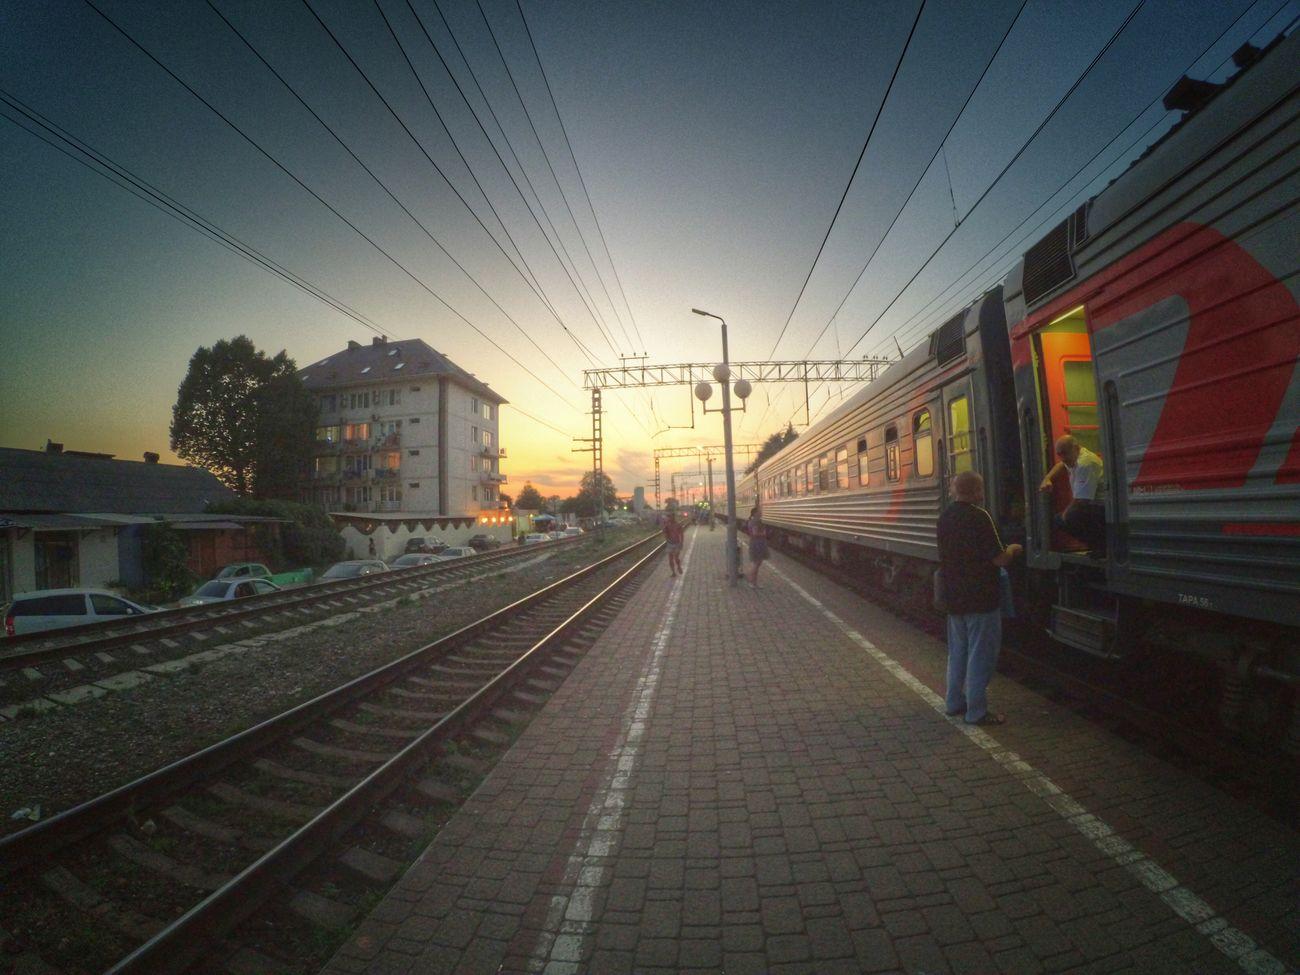 Sunset Summer2016 Train People Hello World Photography Xiaomi Yi Action Camera